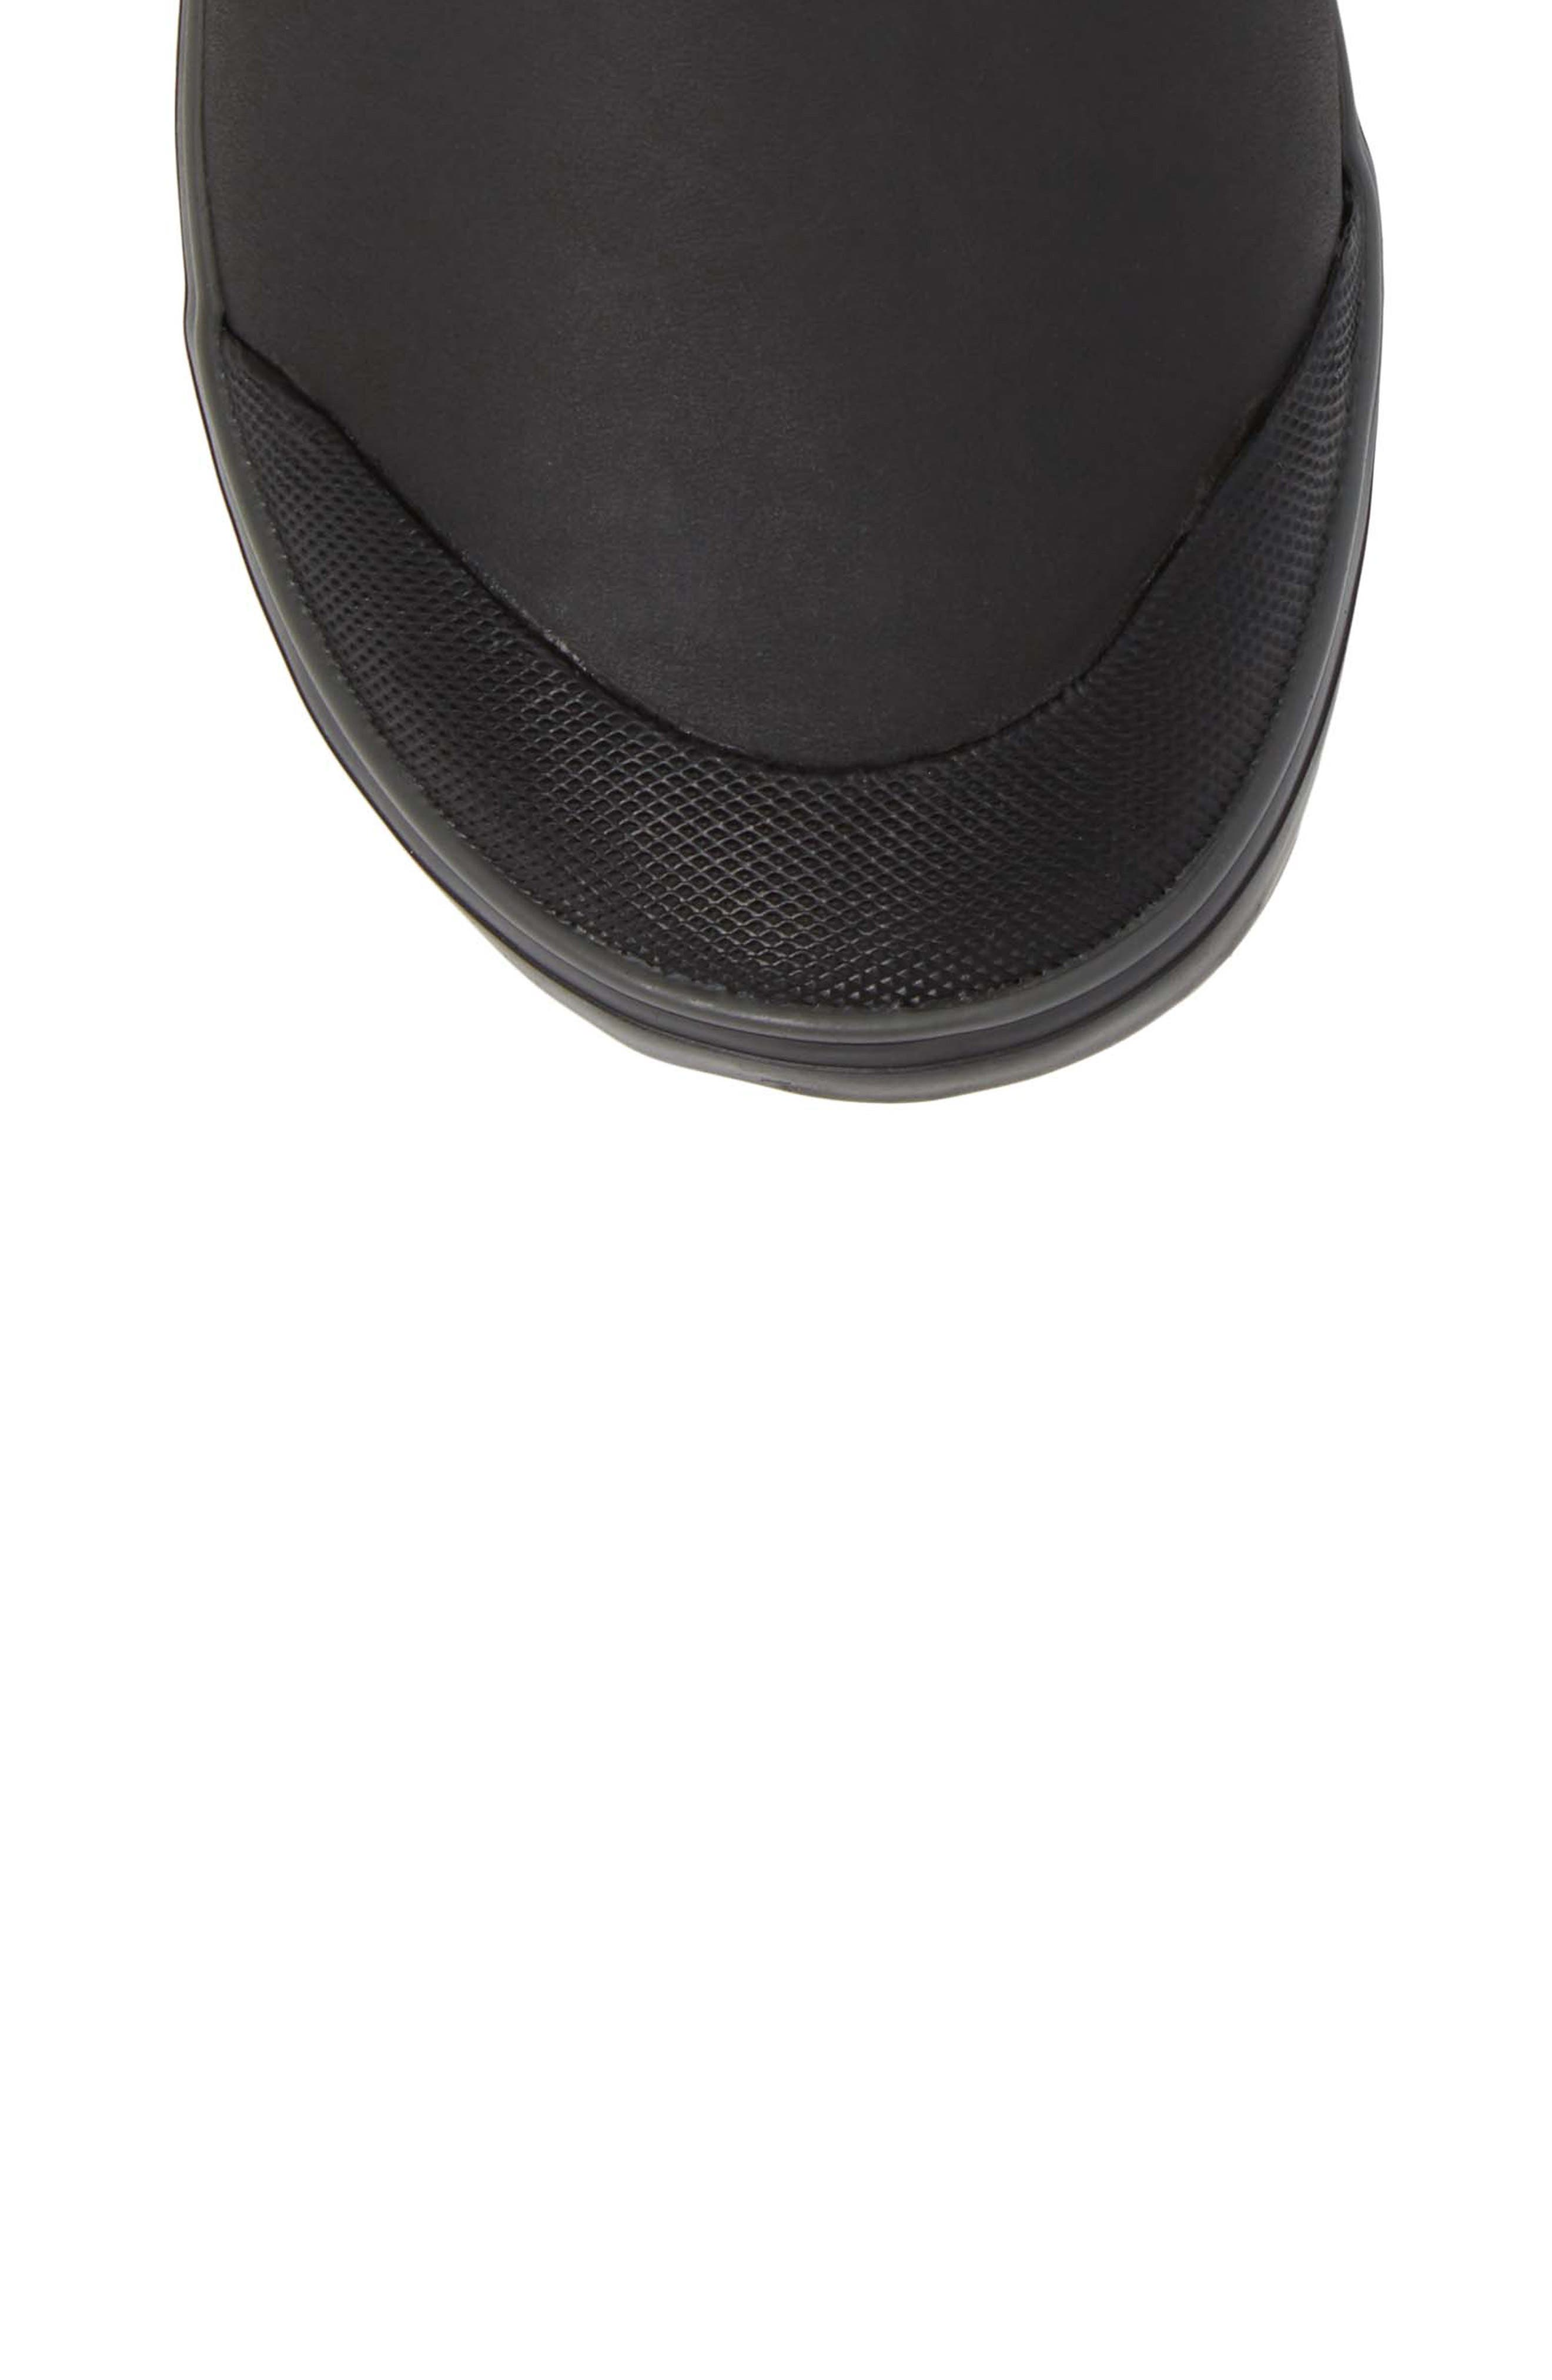 Elsa Chelsea Waterproof Faux Fur Lined Boot,                             Alternate thumbnail 5, color,                             Black Wool Leather